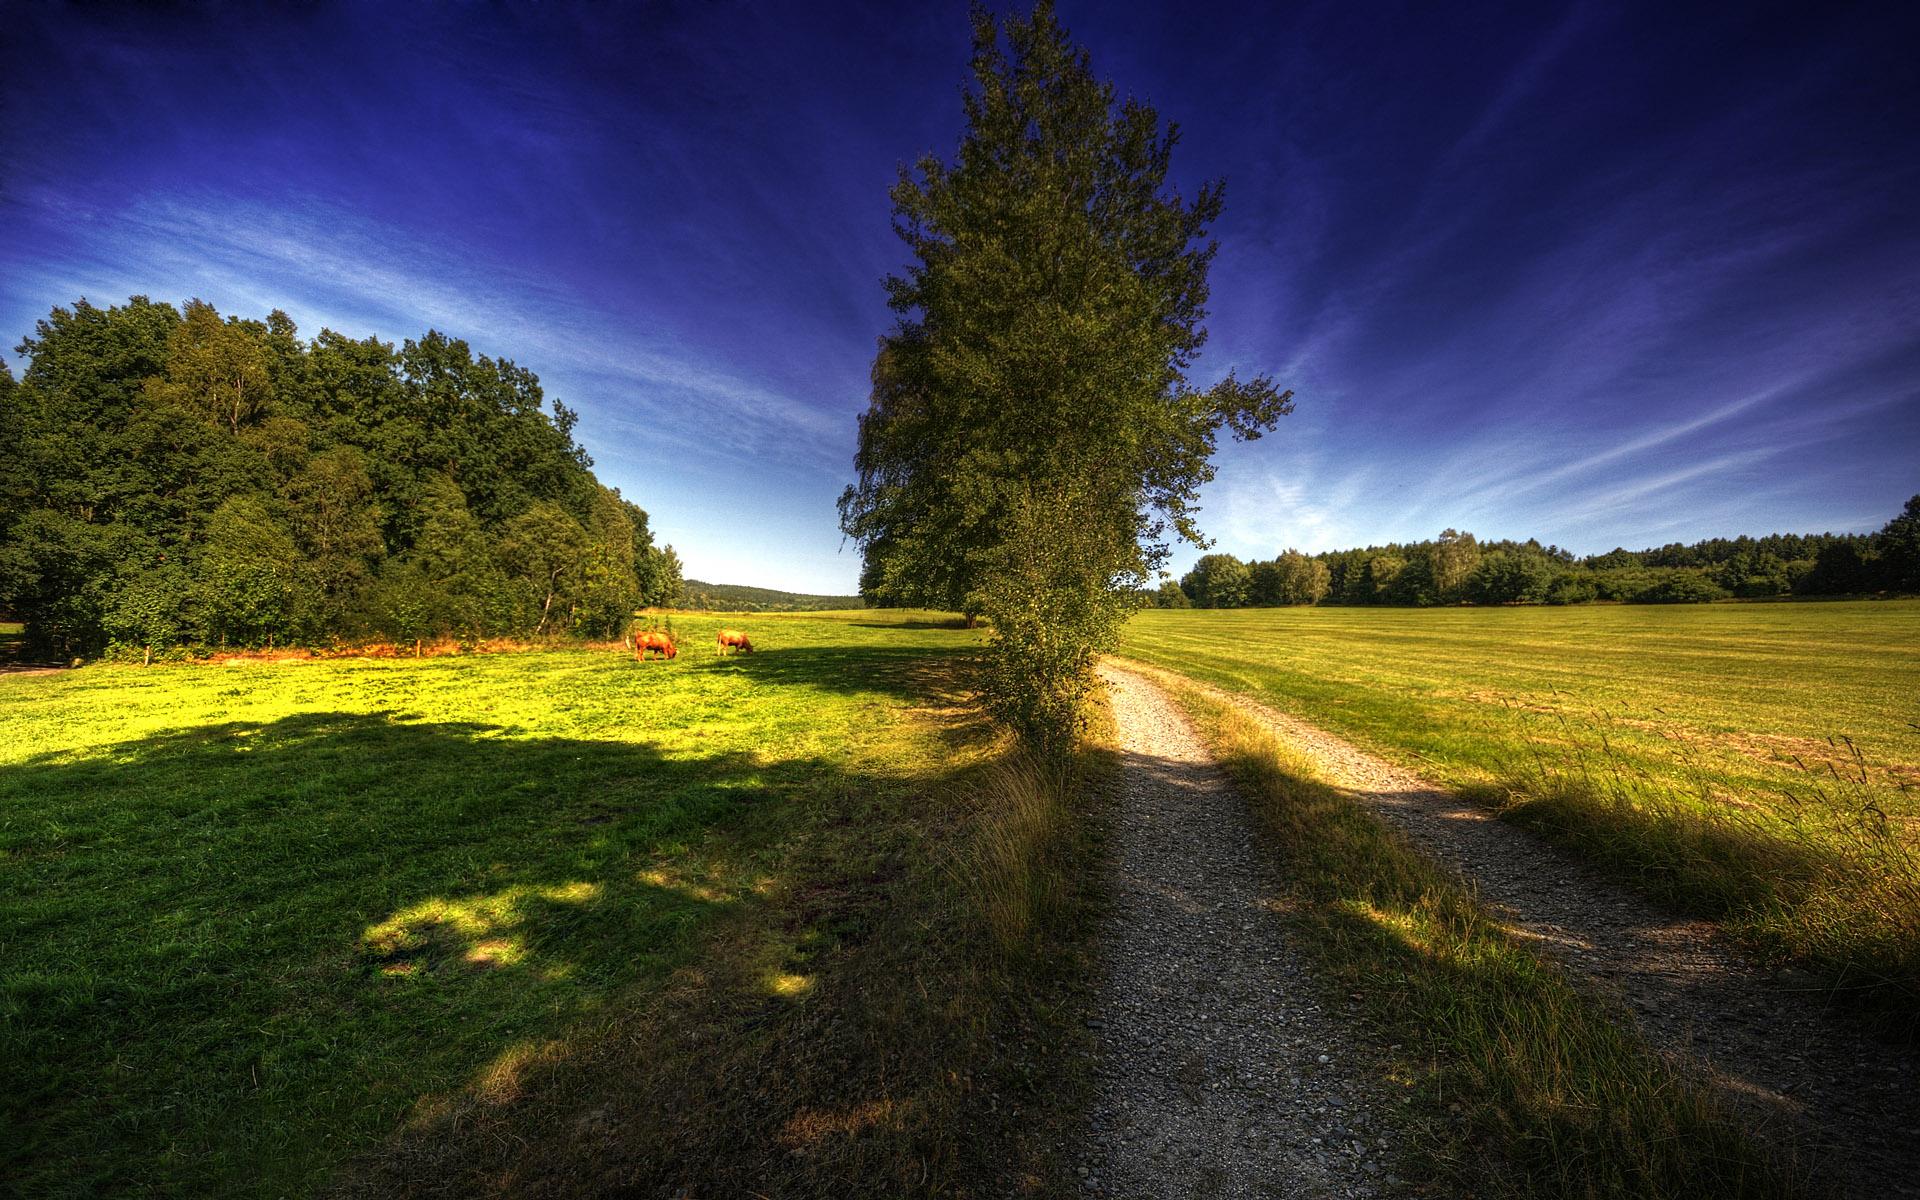 http://s7.picofile.com/file/8240906776/MahPic_Com_Beautiful_Landscapes_71_.jpg